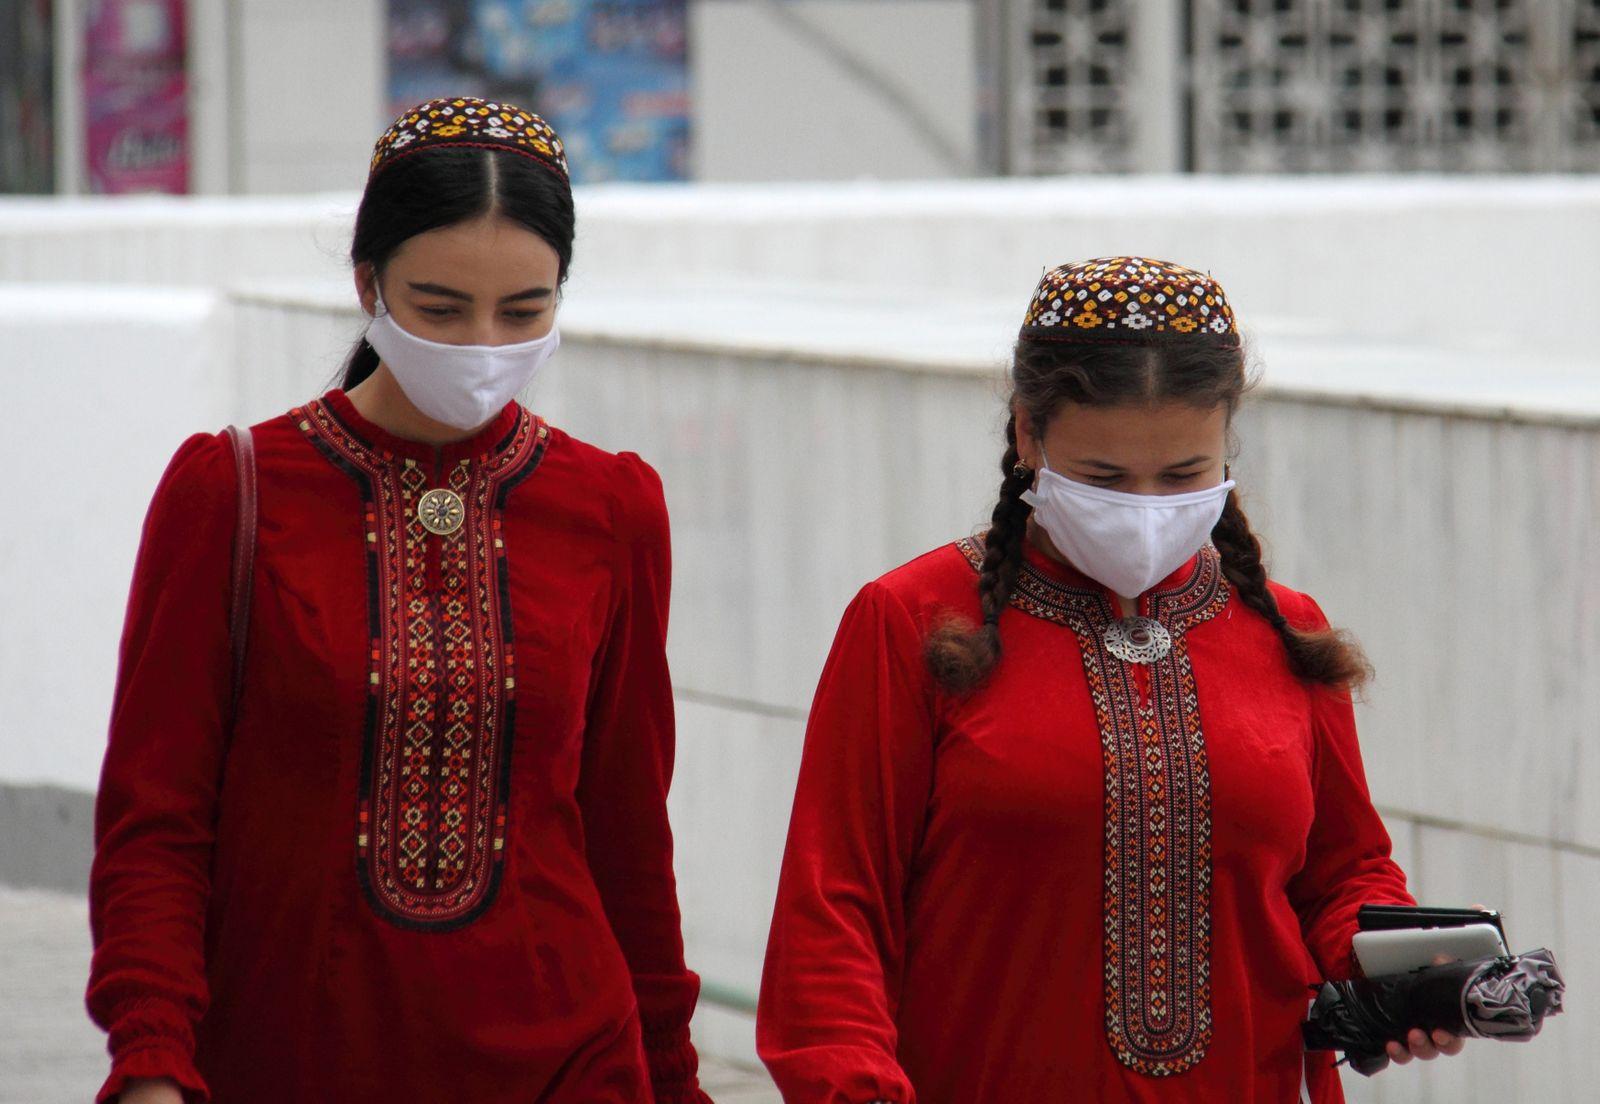 Women wearing protective face masks walk along the street in Ashgabat